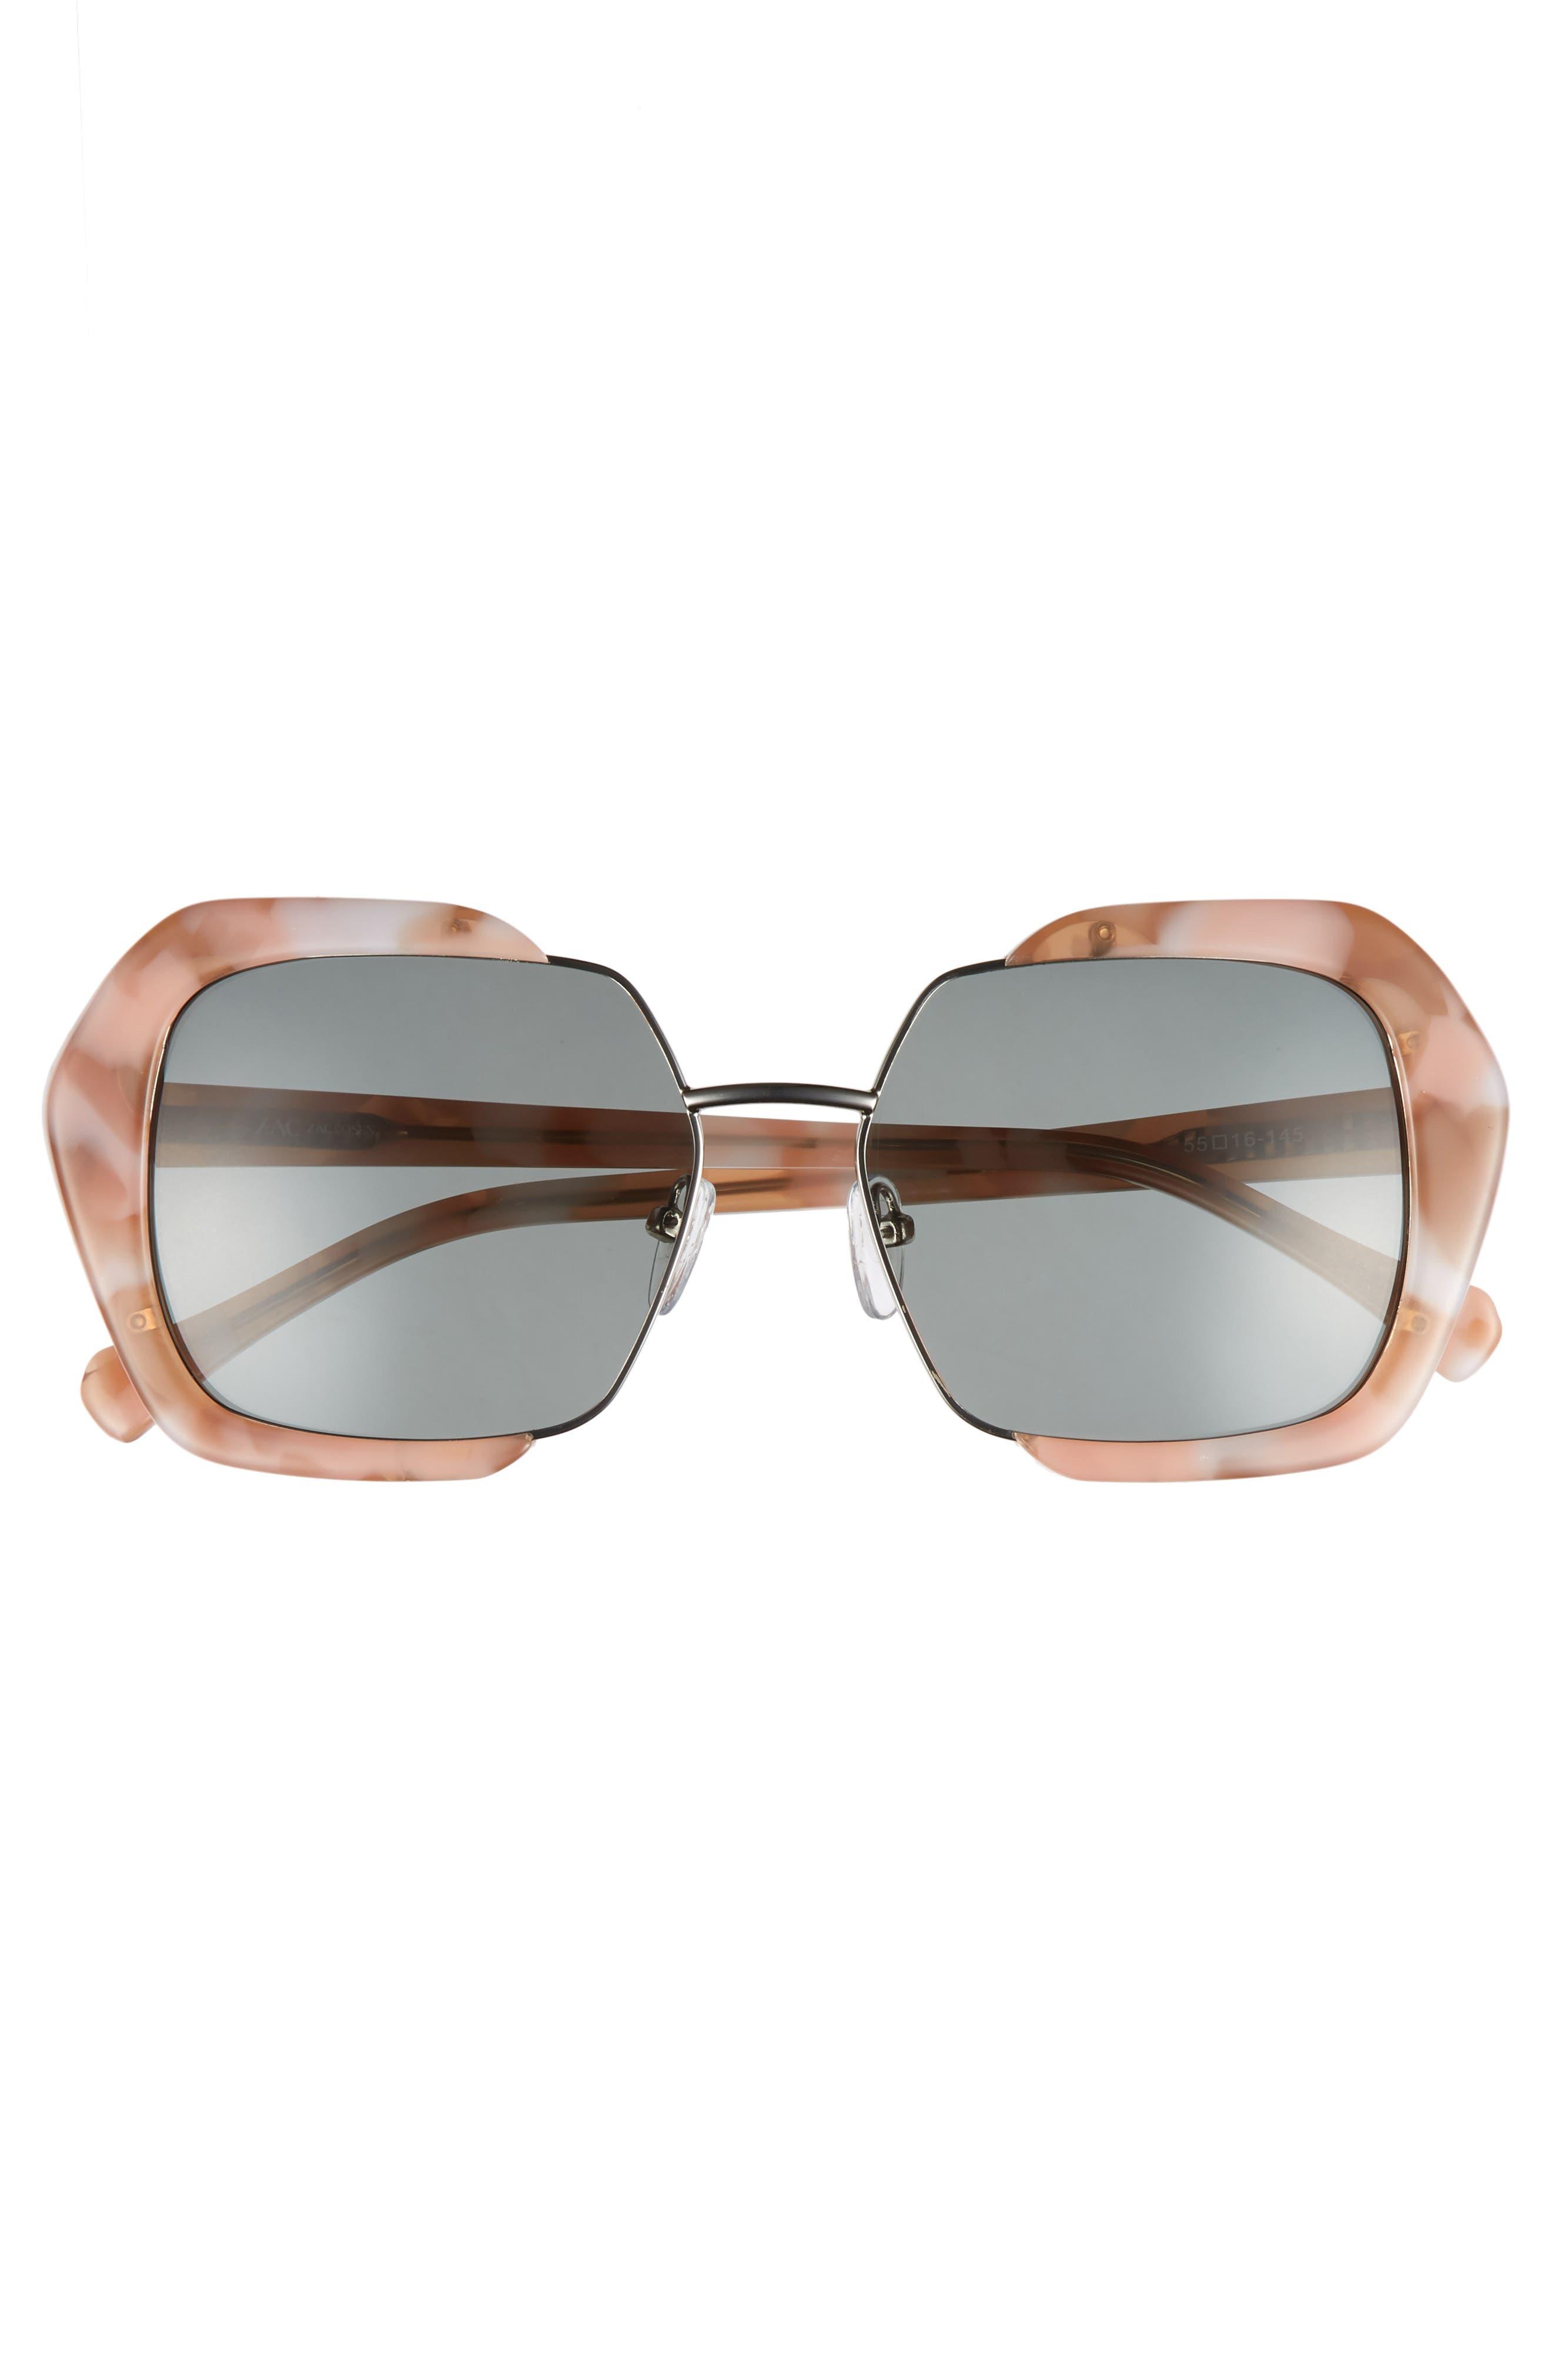 Isleen 55mm Polarized Sunglasses,                             Alternate thumbnail 3, color,                             Pink/ Tortoise/ Gold